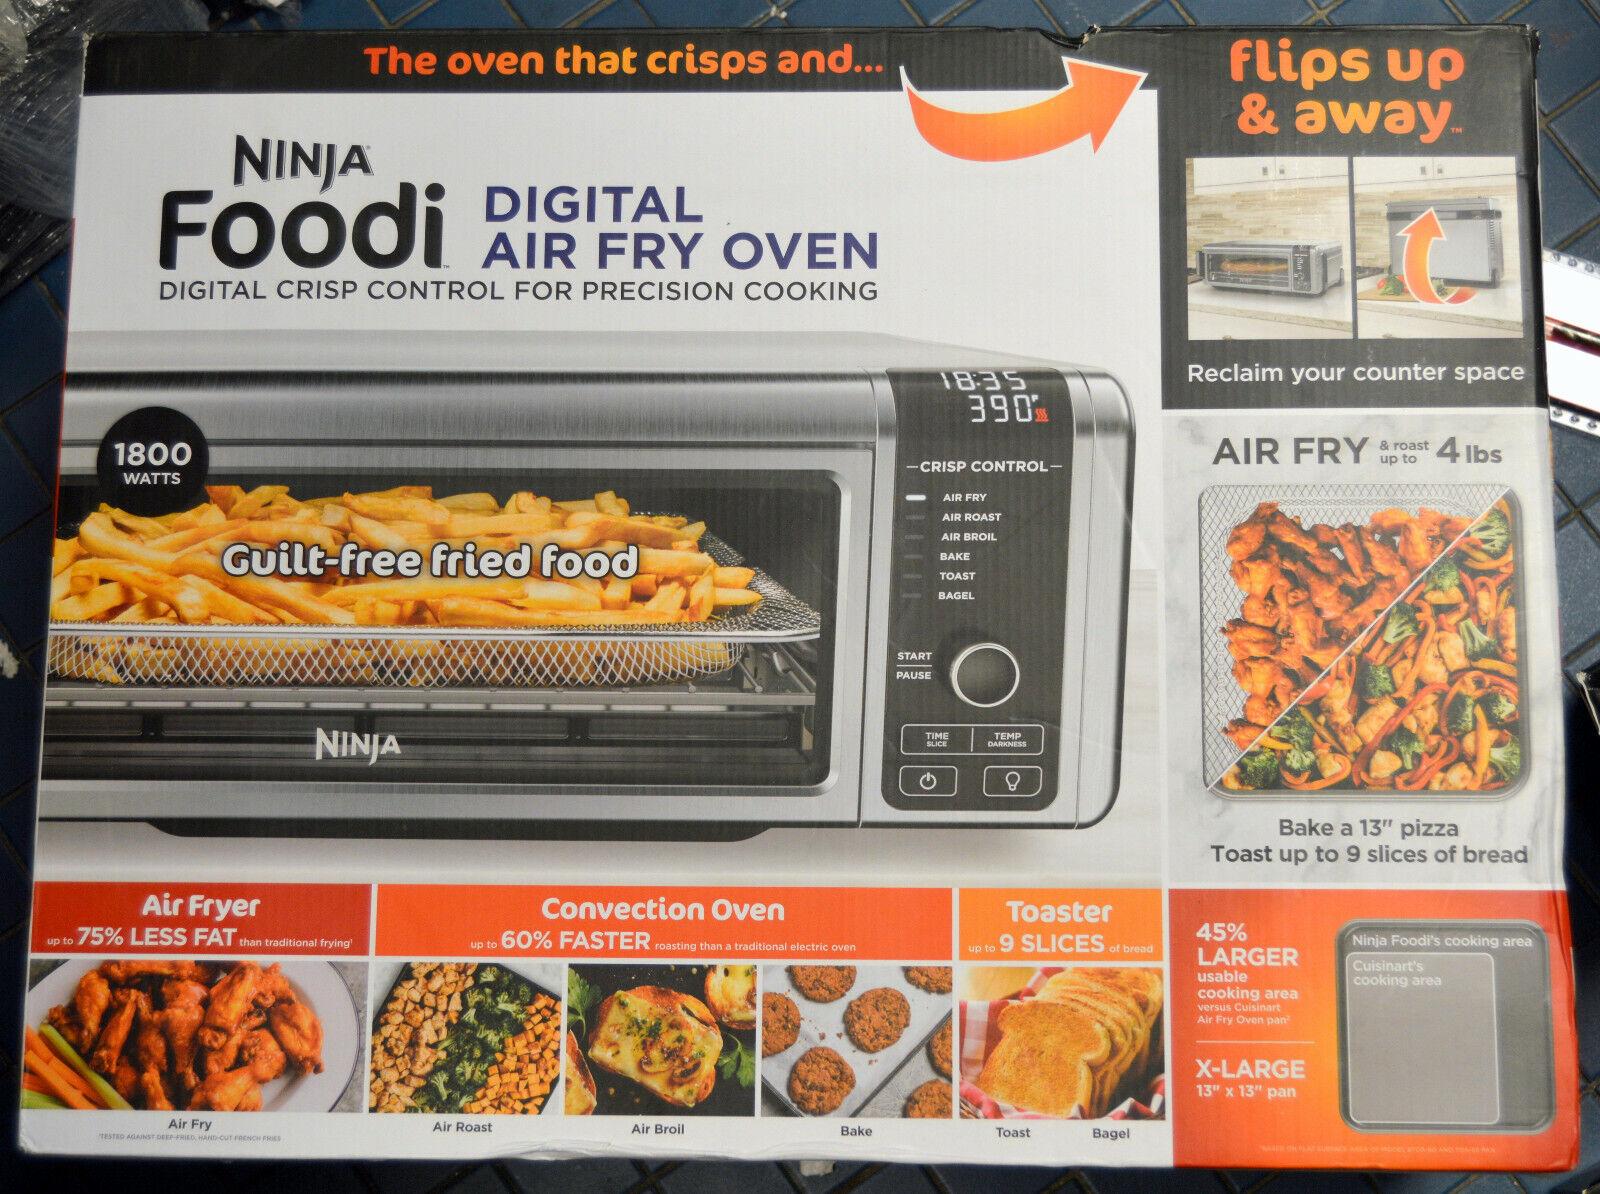 Ninja Foodi SP100 Digital Air Fryer Oven Convection Oven Toa